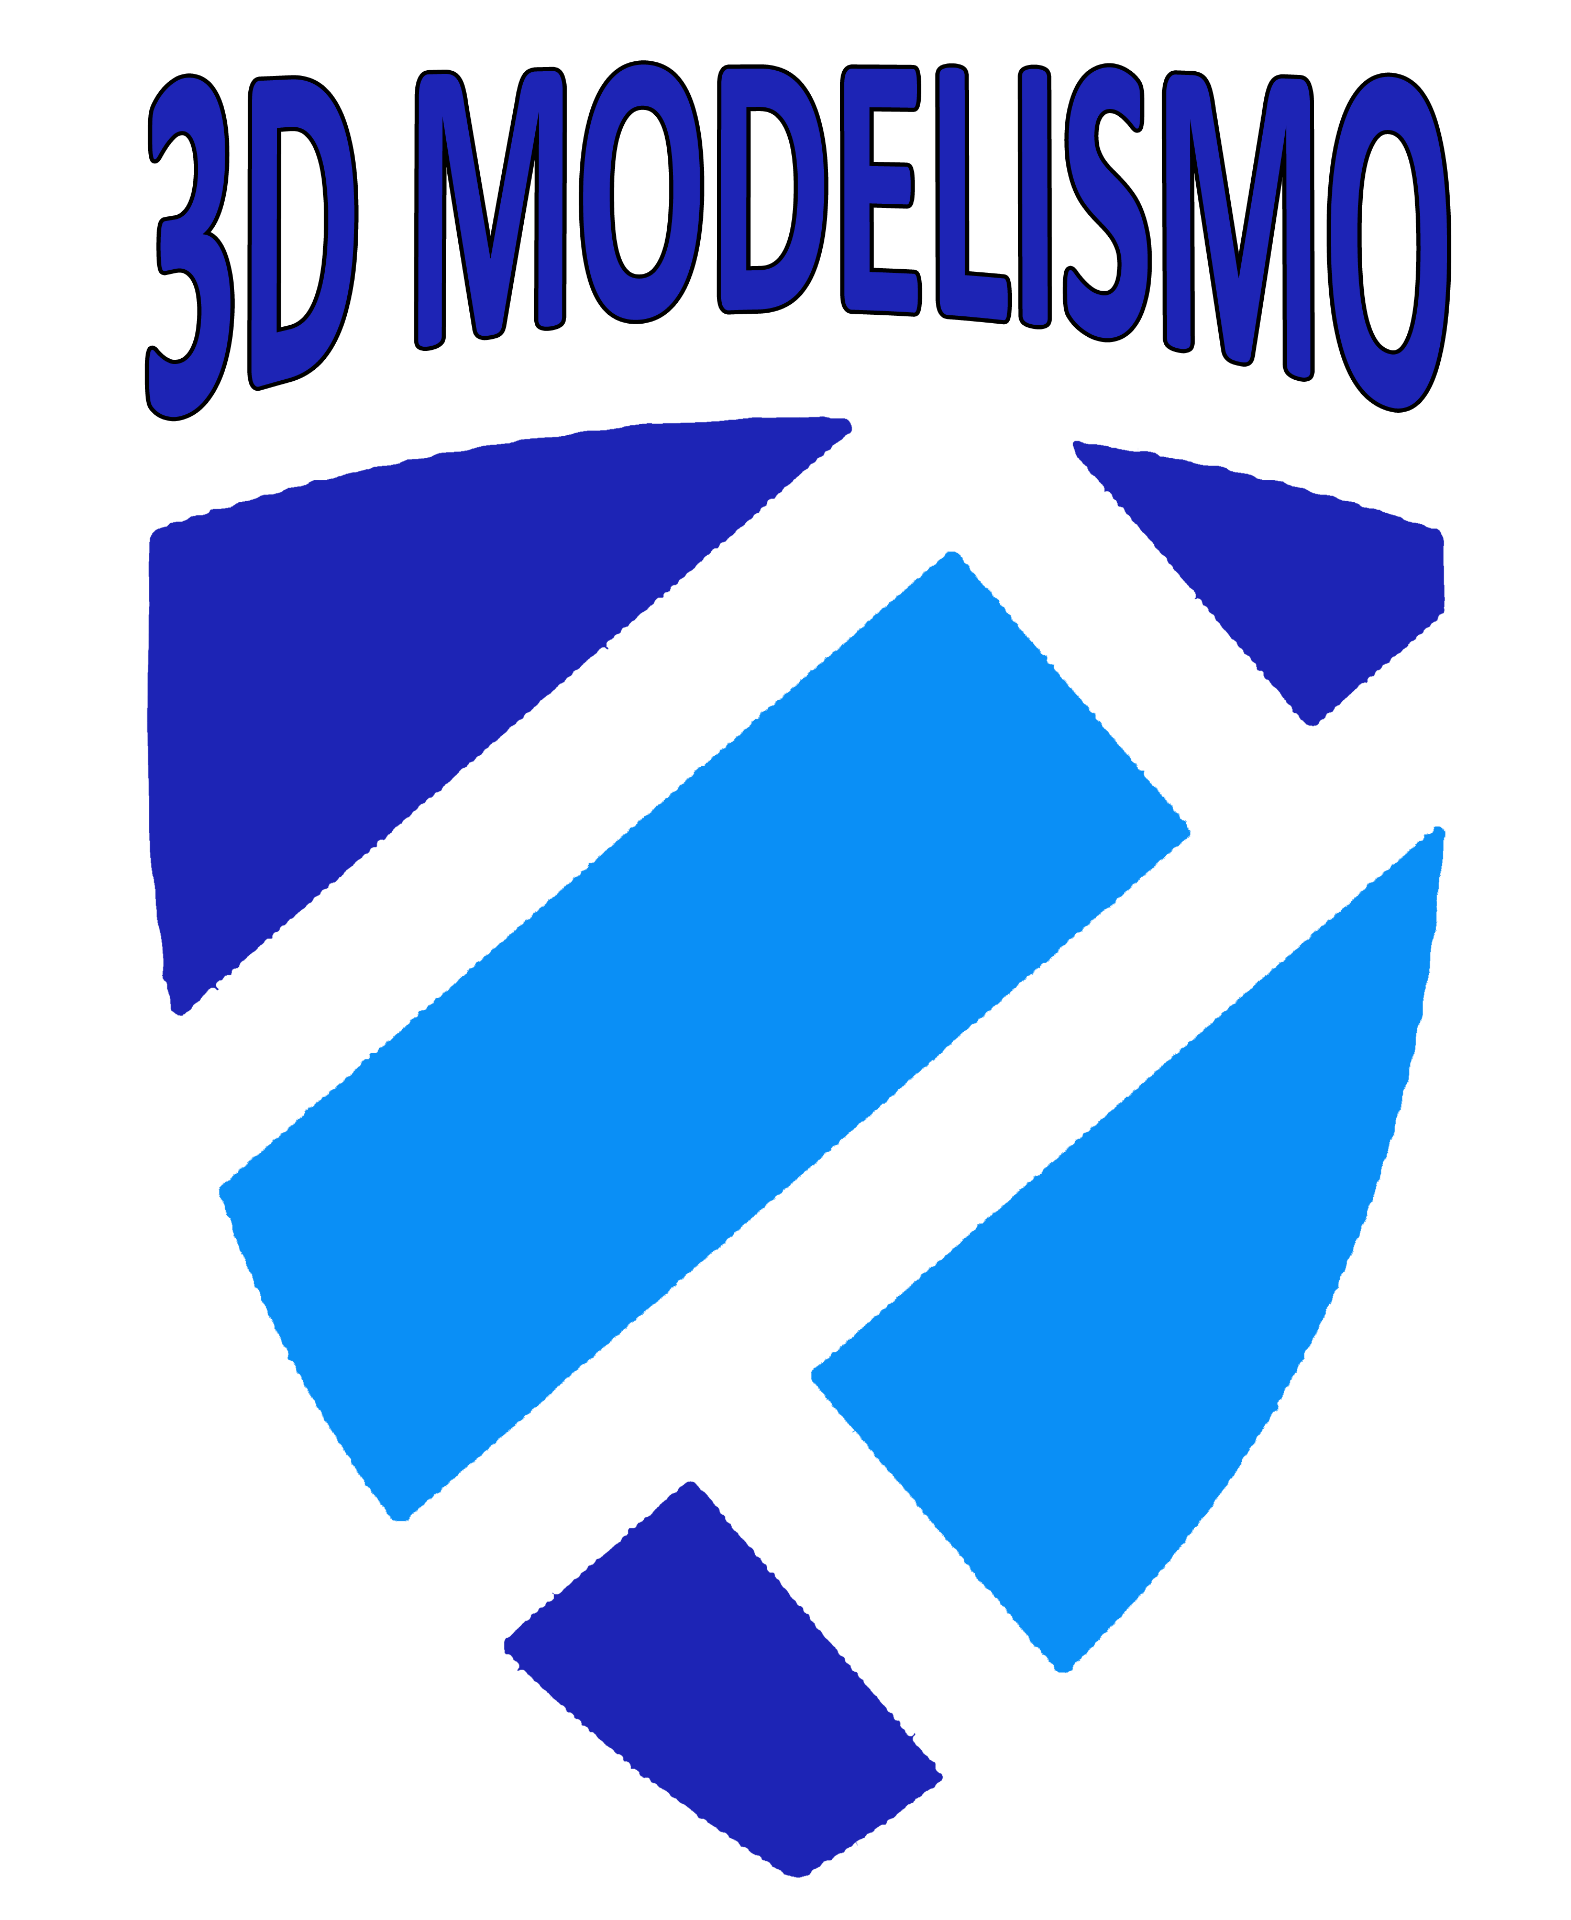 3D MODELISMO